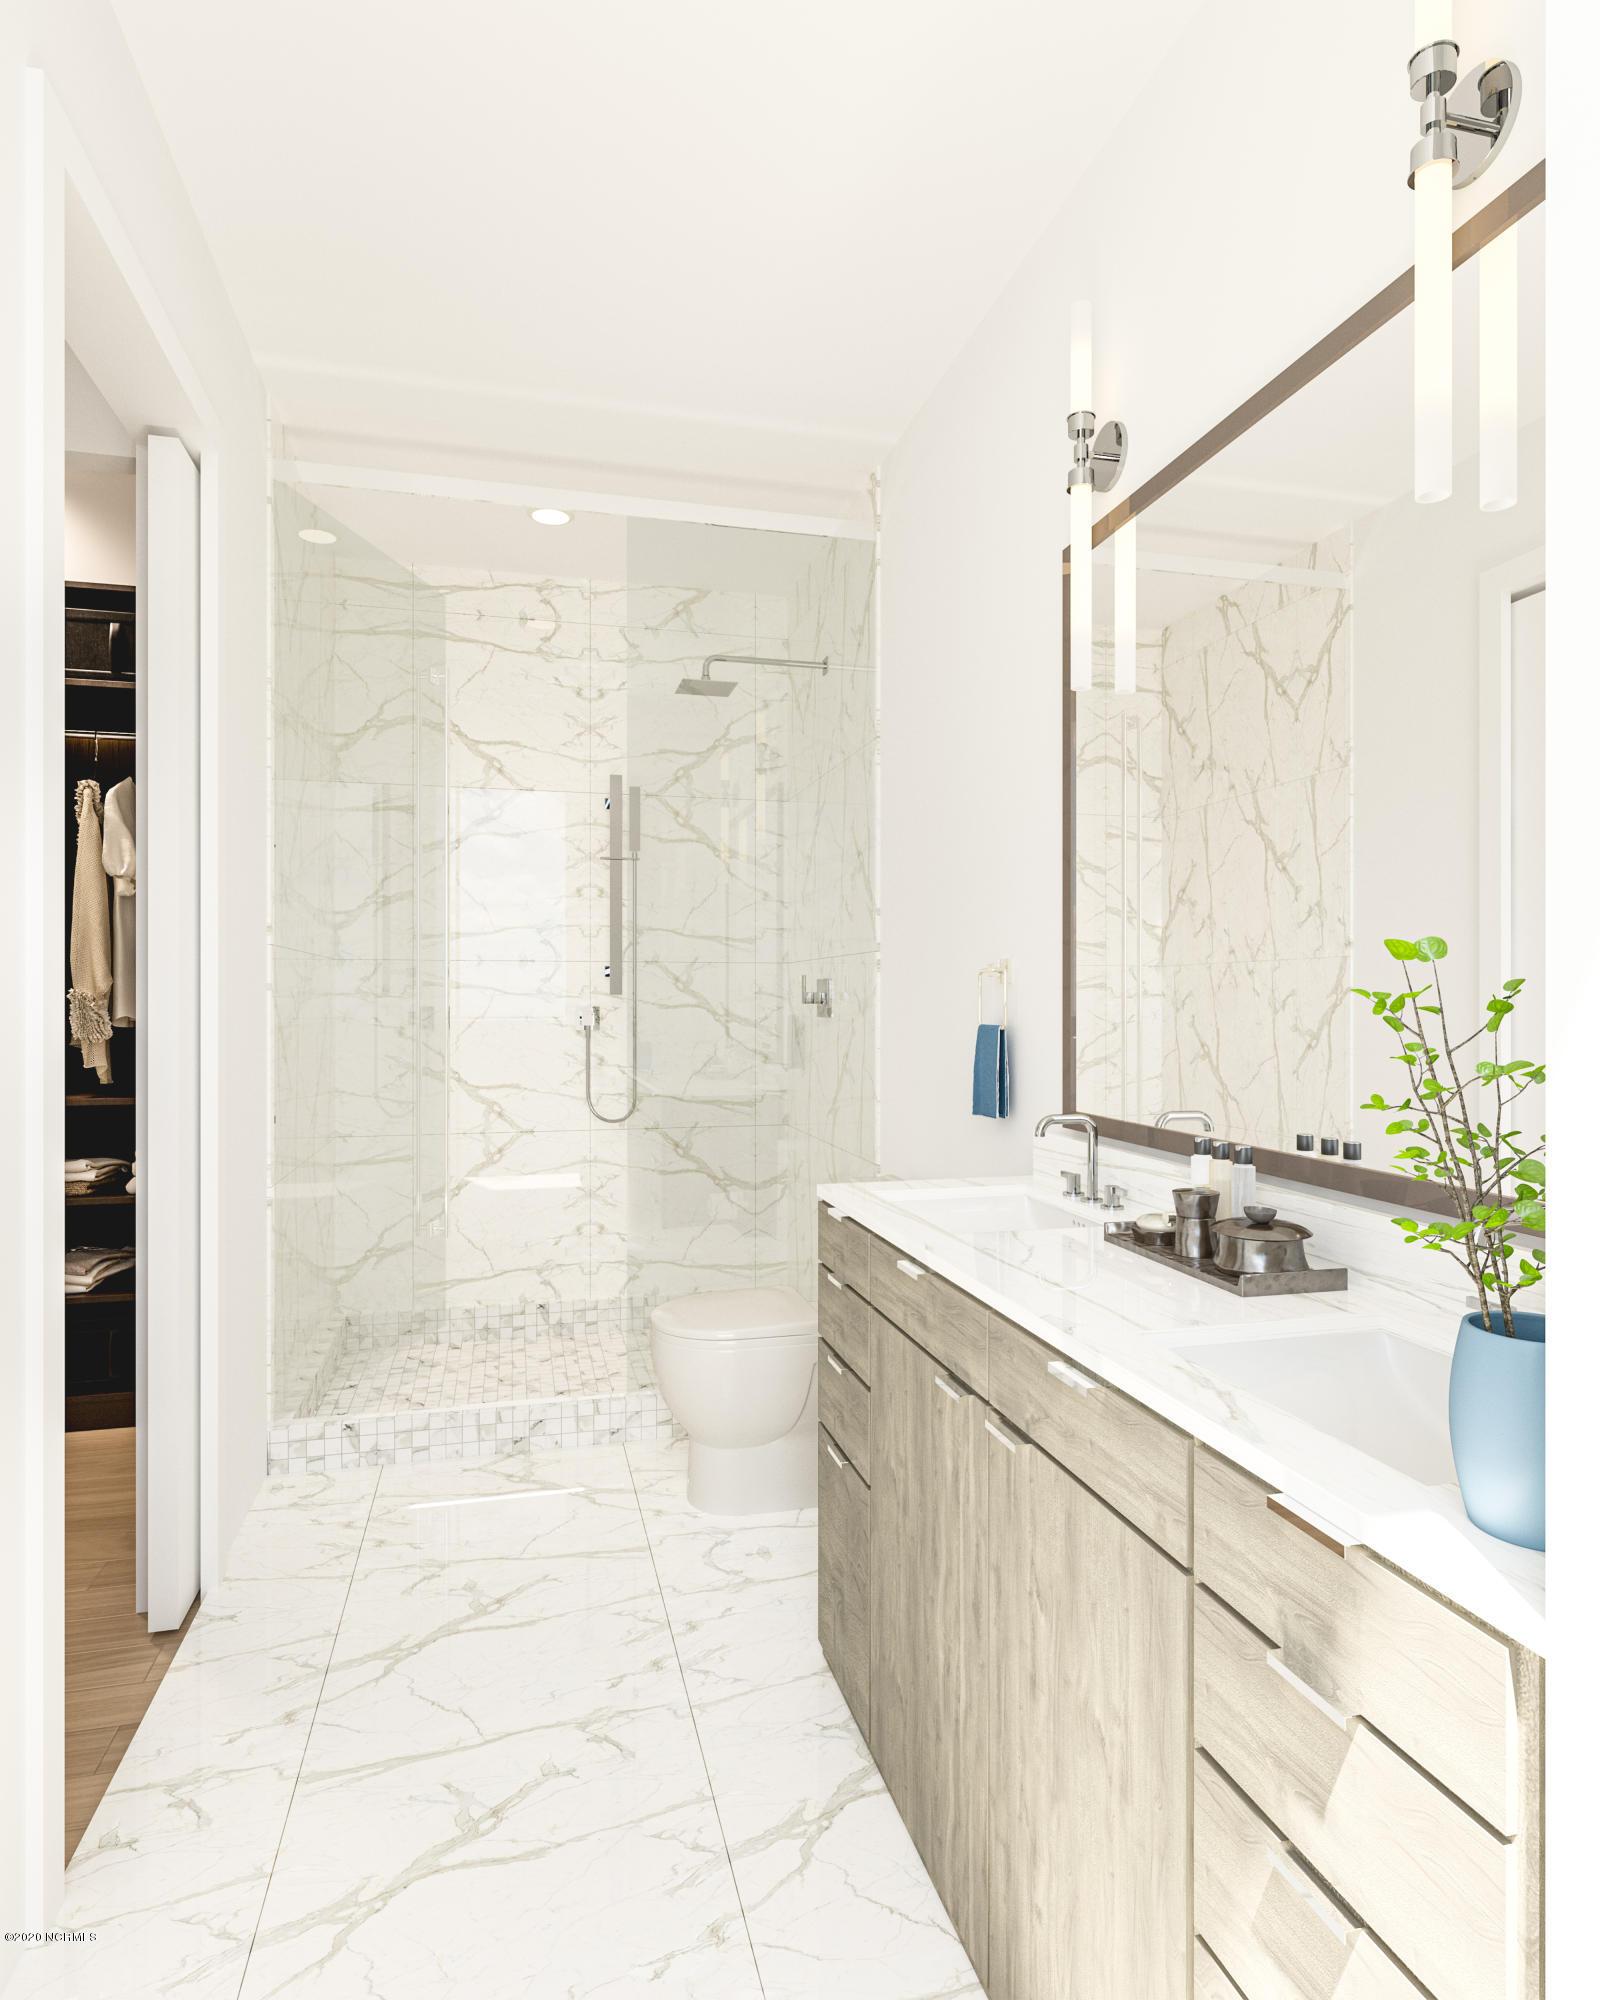 2 Marina Street, Wrightsville Beach, North Carolina 28480, 3 Bedrooms Bedrooms, 6 Rooms Rooms,3 BathroomsBathrooms,Condominium,For sale,Marina,100217652